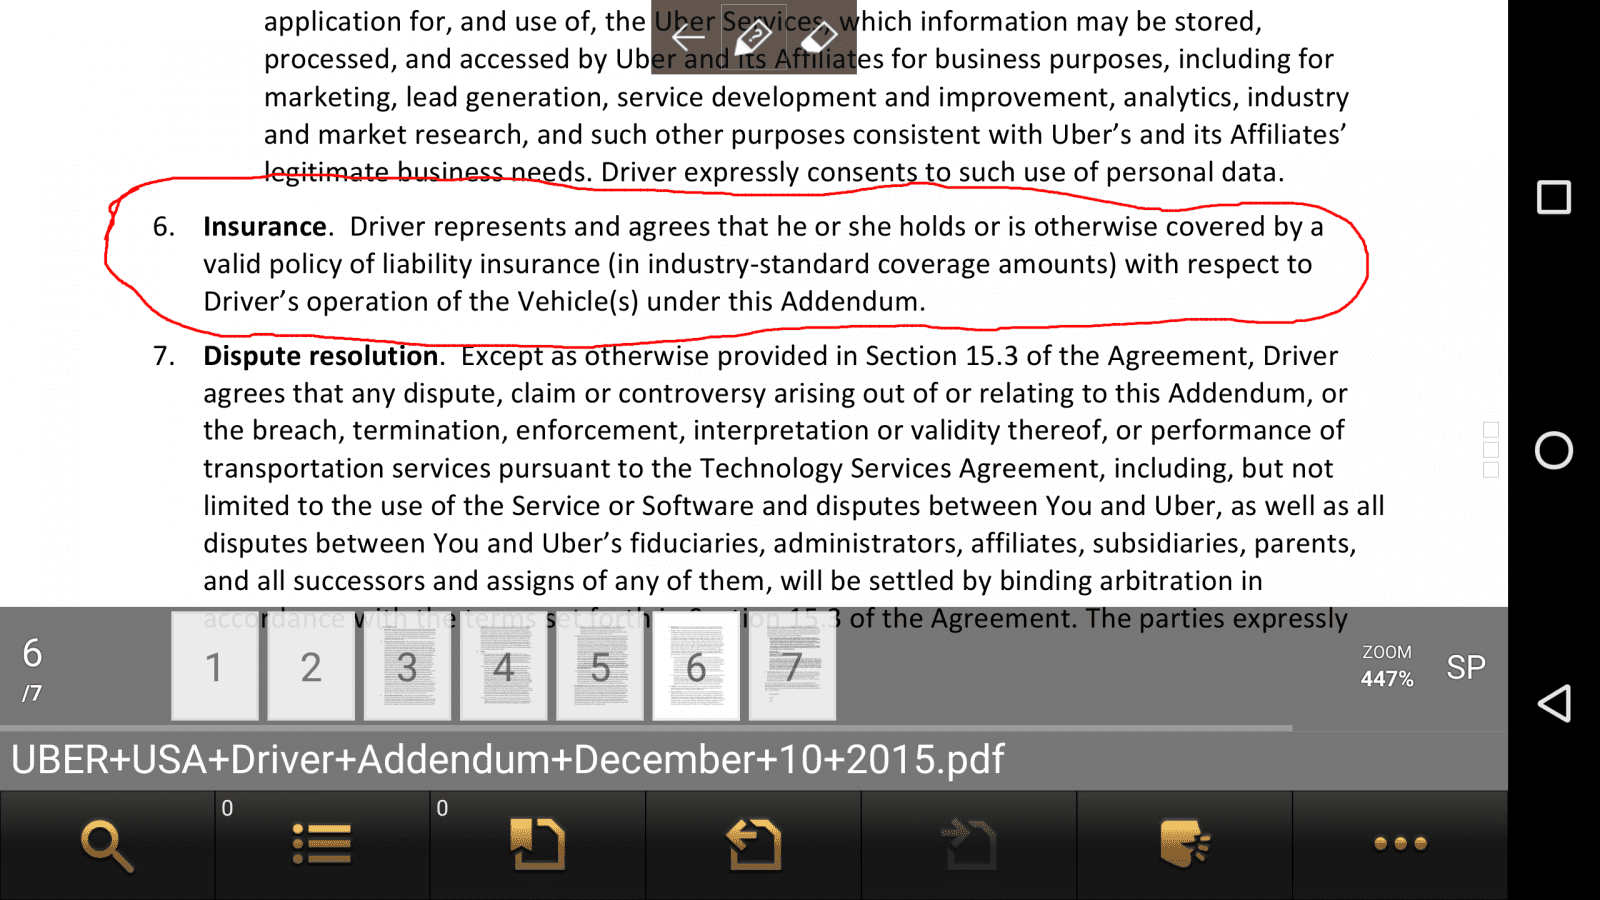 New US Uber Partner Agreement - Dec 11, 2015 (Arbitration